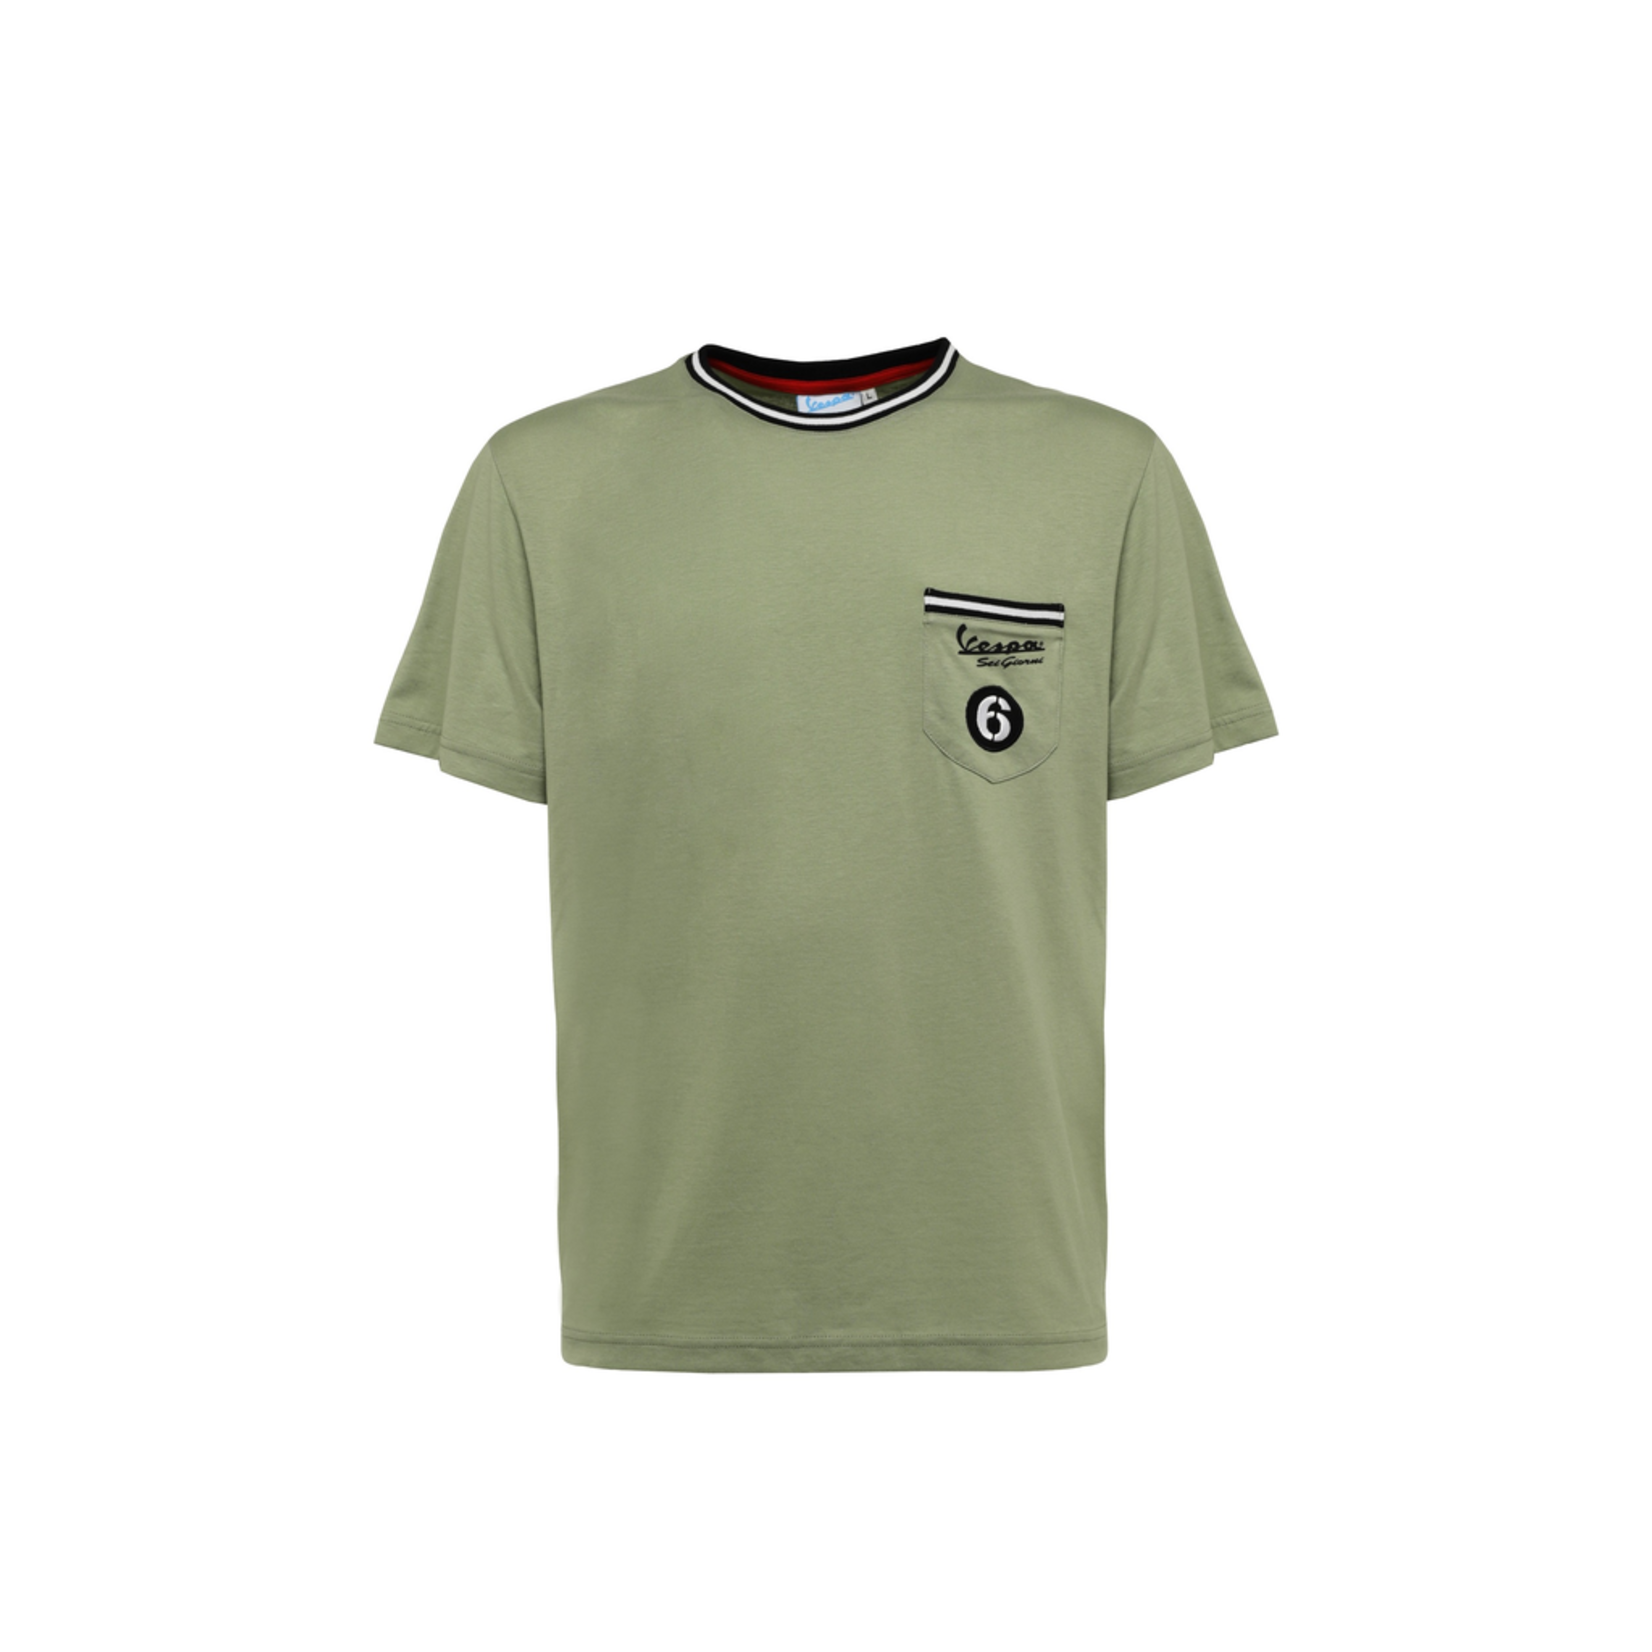 Apparel T-Shirt, Men's Sei Giorni Green